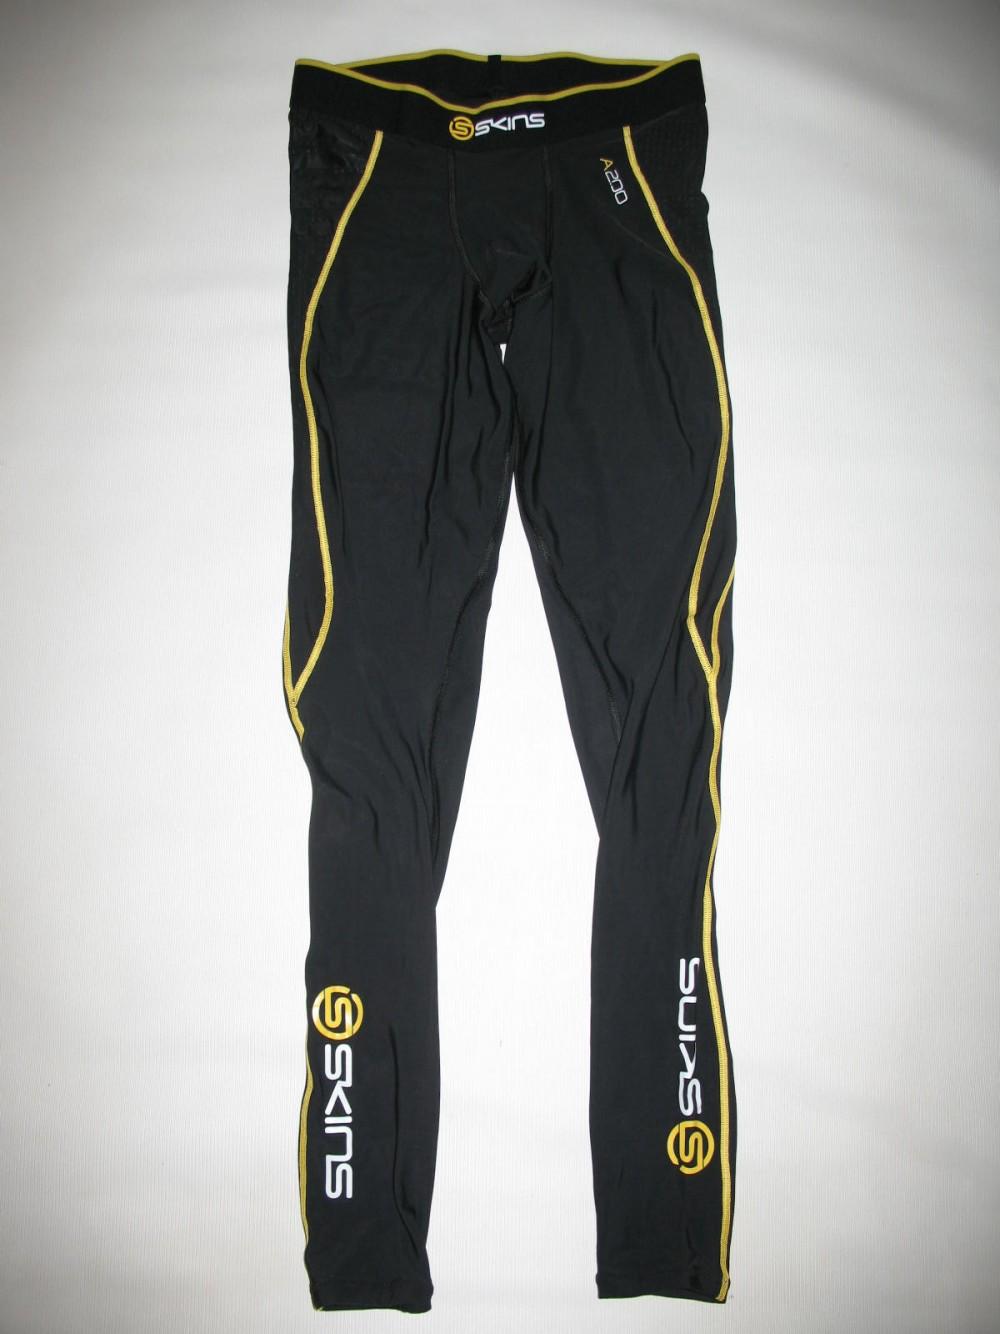 Футболка+брюки SKINS A200  short sleeves jersey+ long tights (размер M) - 4